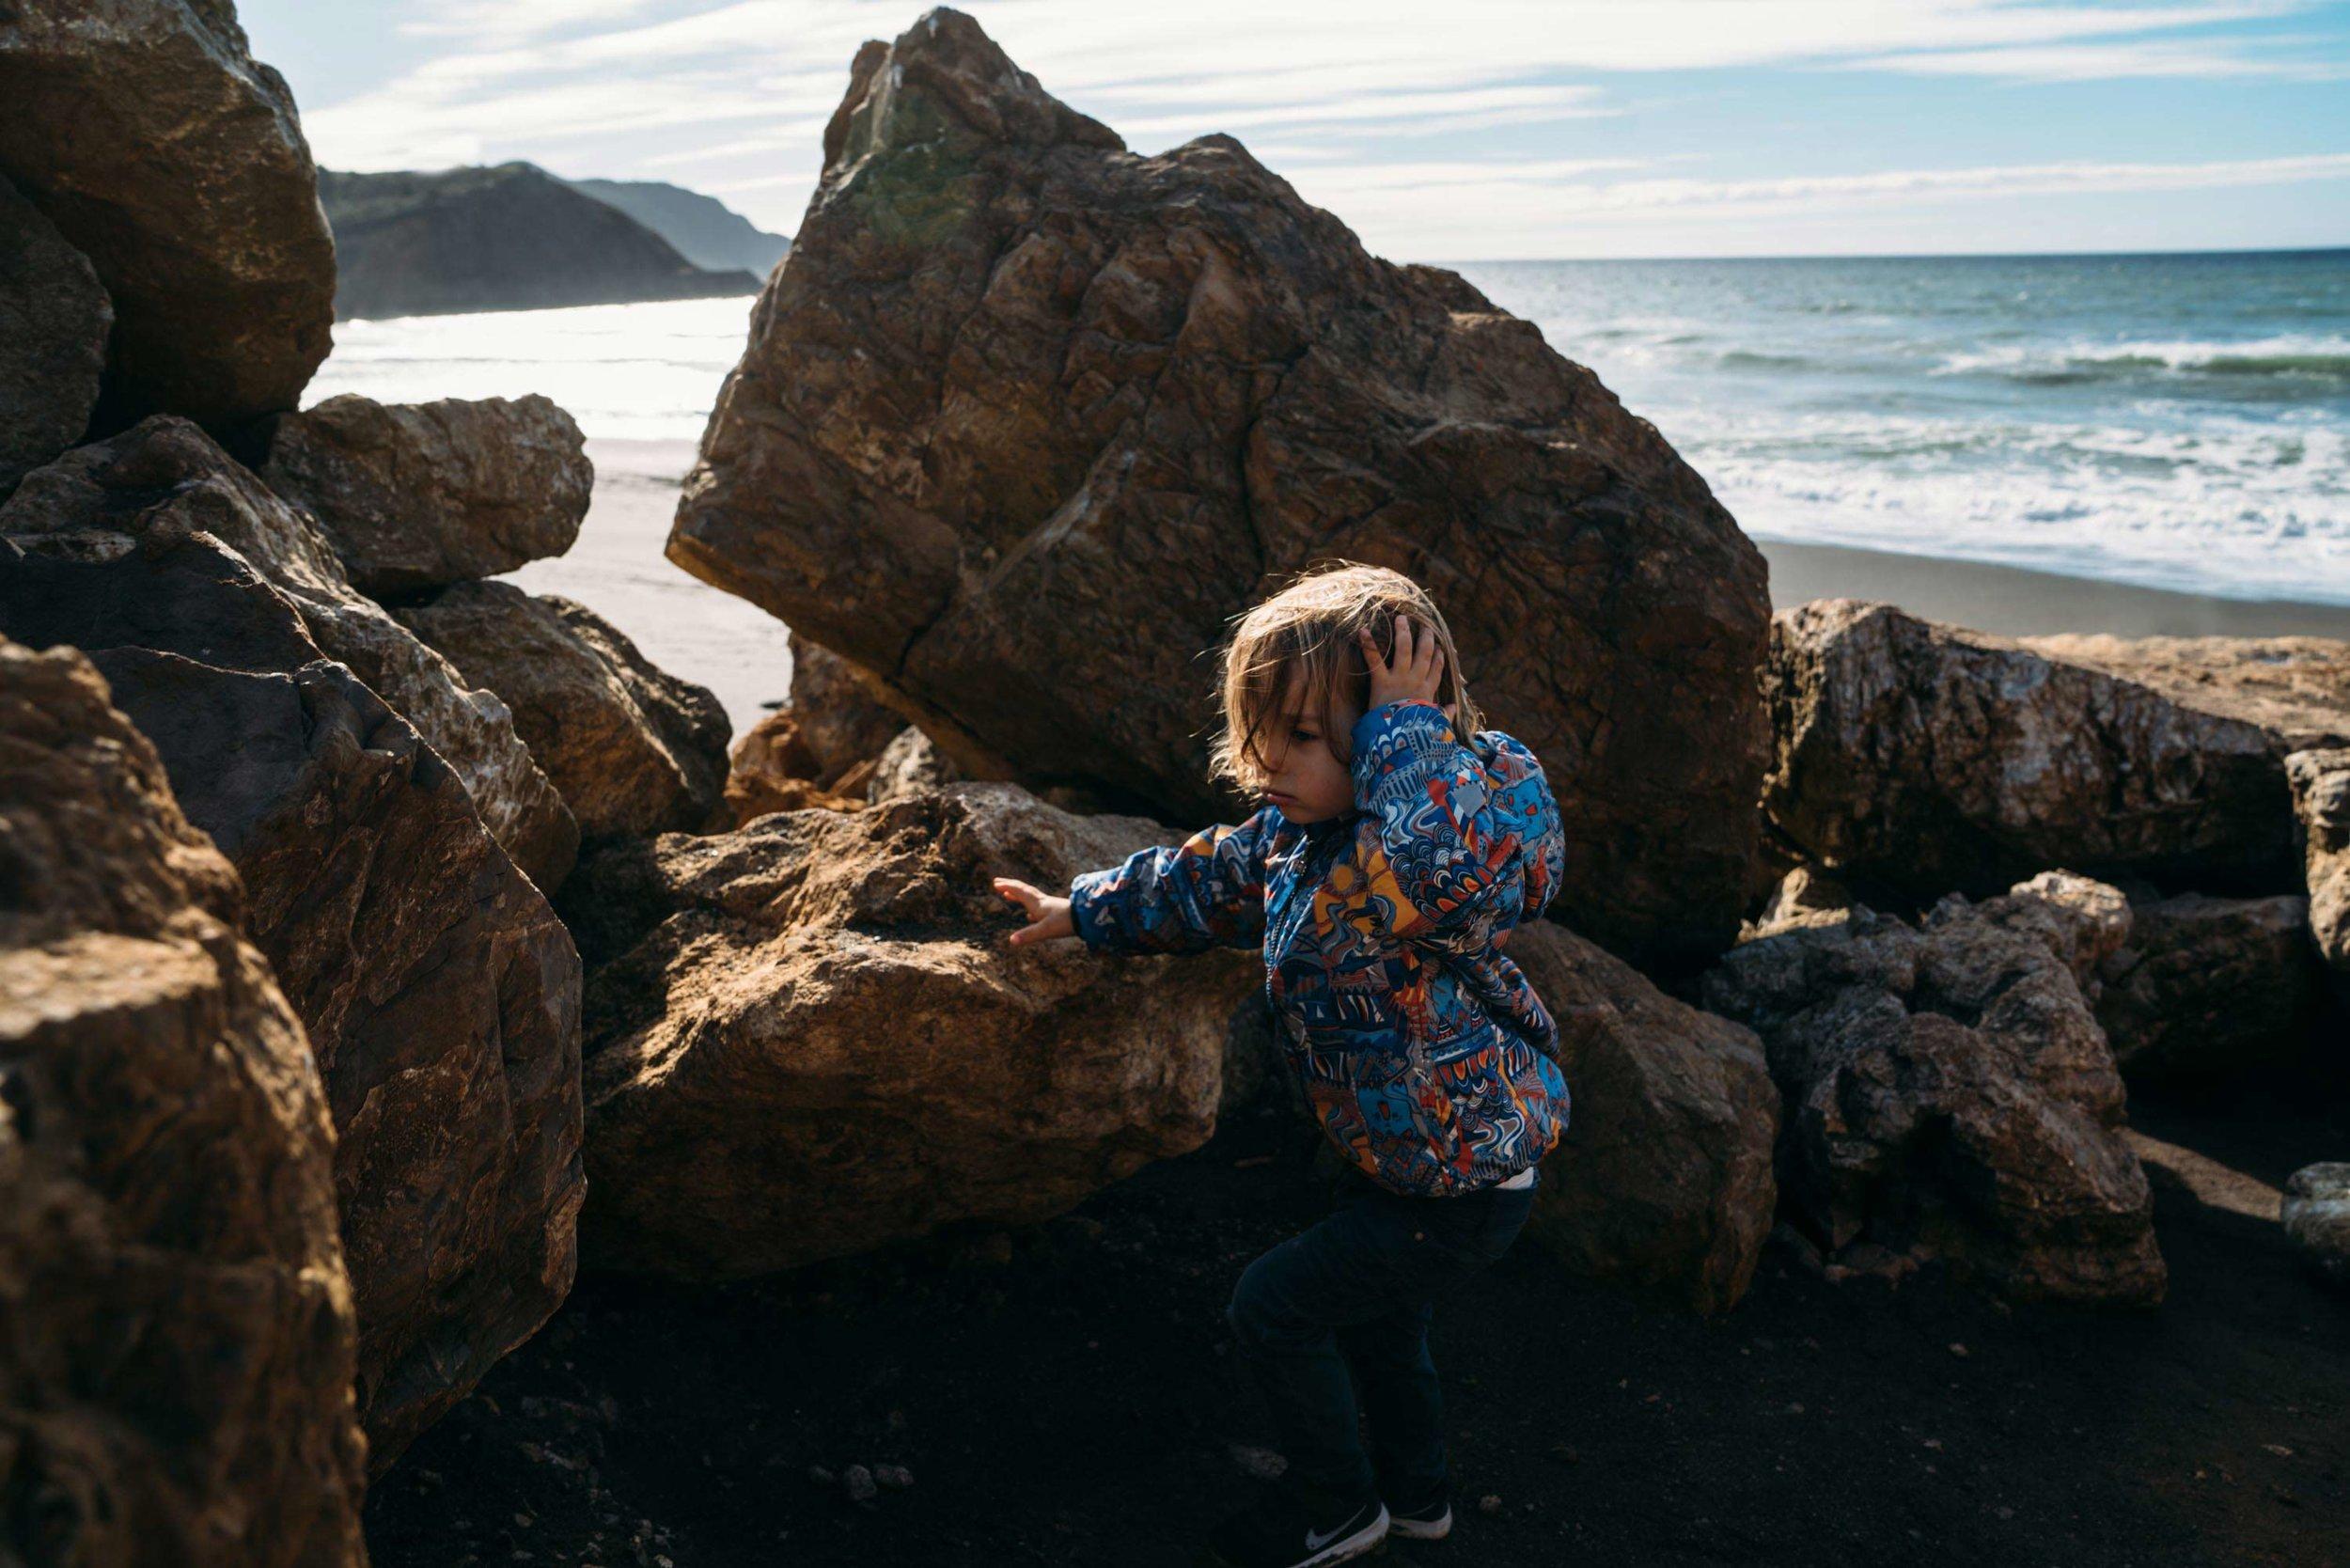 kyson-dana-rockaway-beach-nov-28-1.jpg